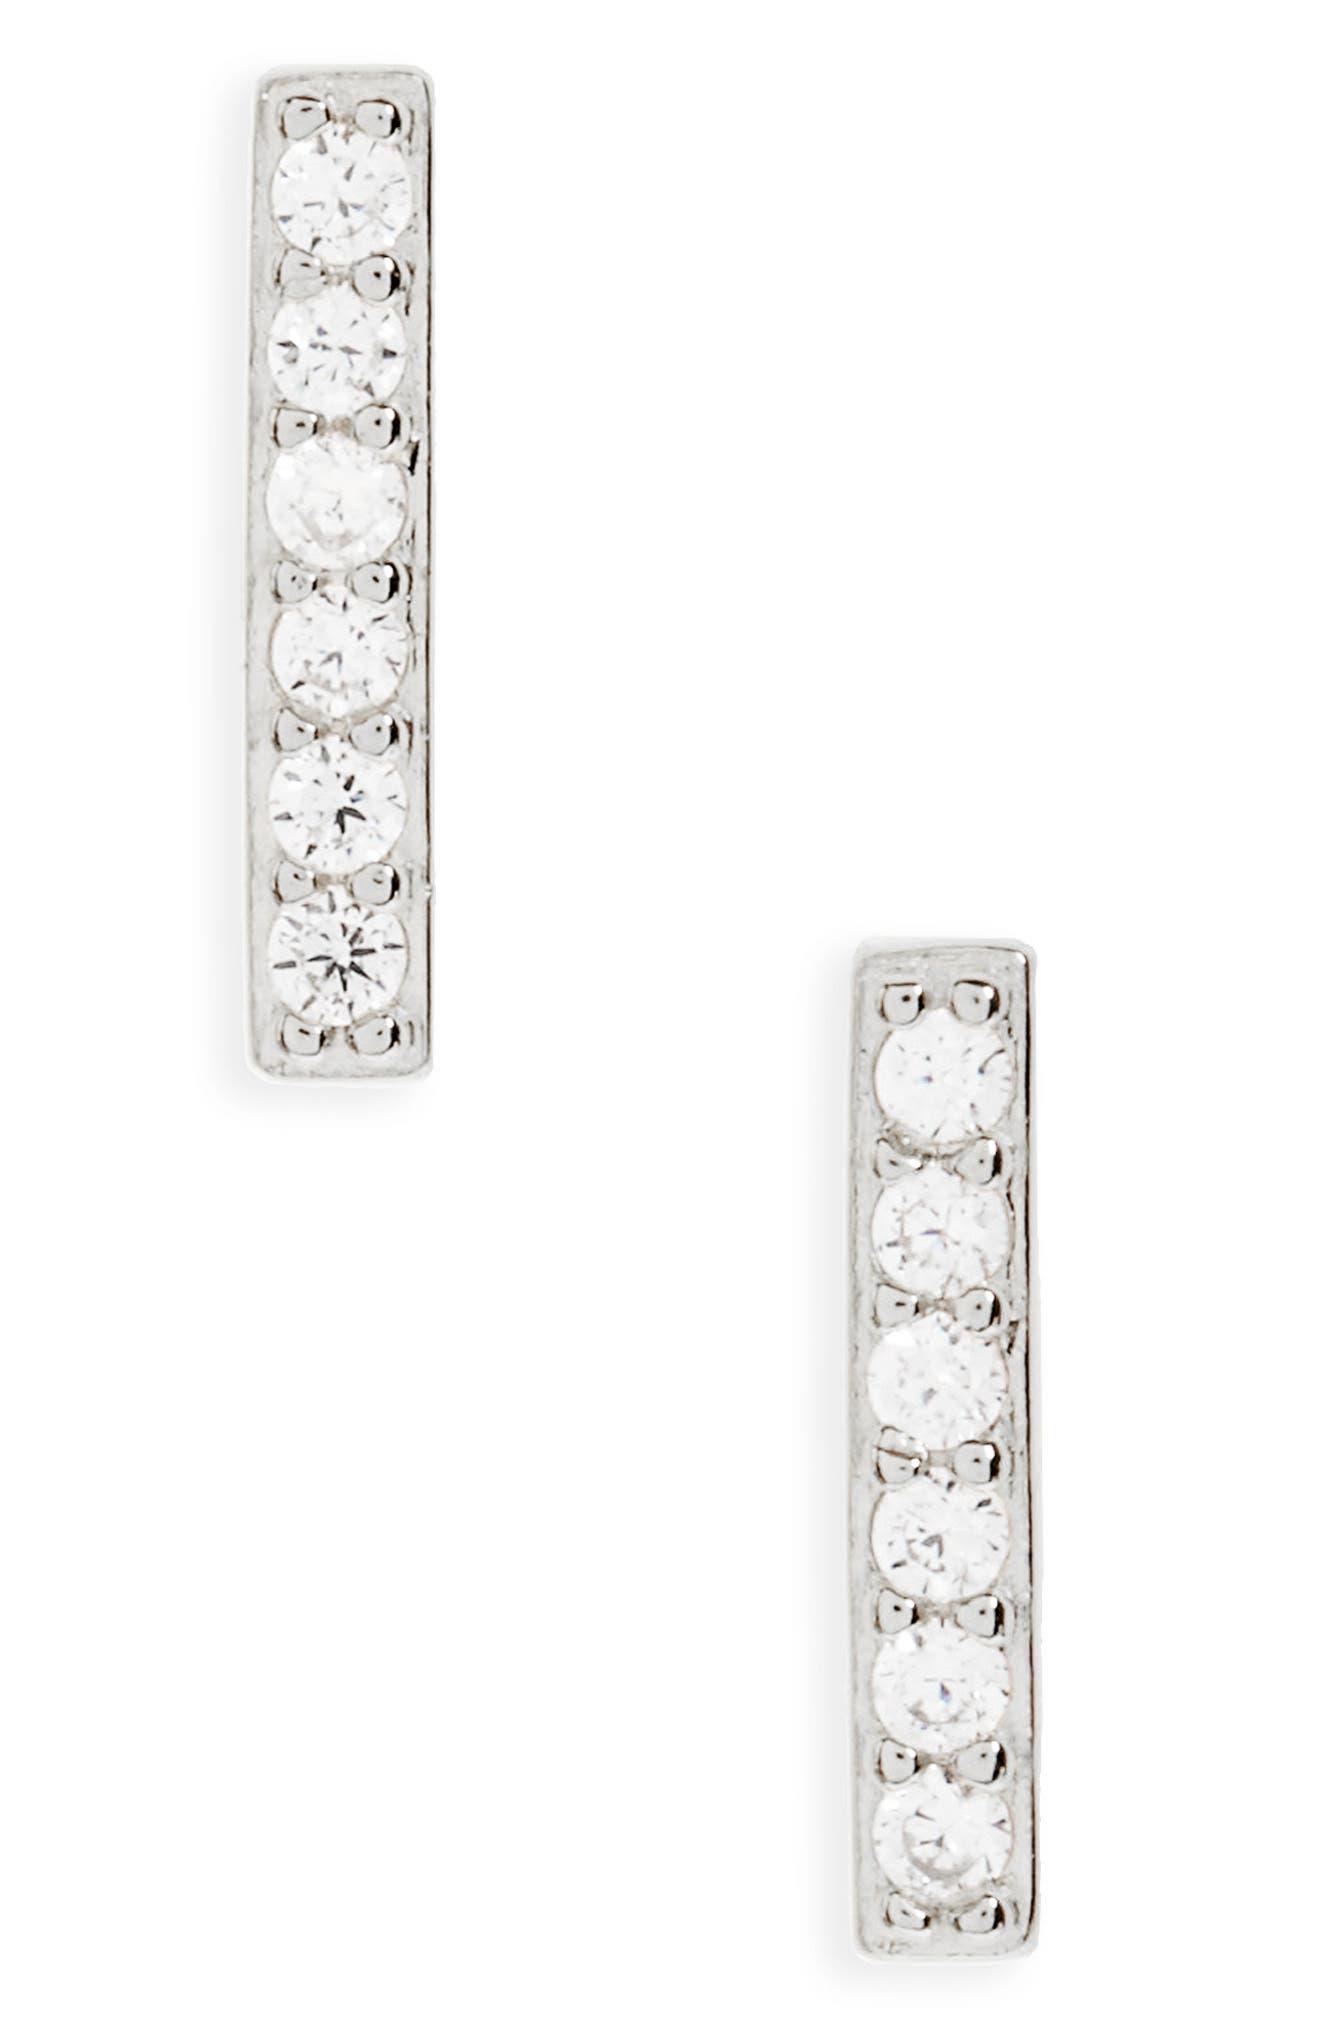 Precious Metal Plated Cubic Zirconia Bar Earrings,                         Main,                         color, 040